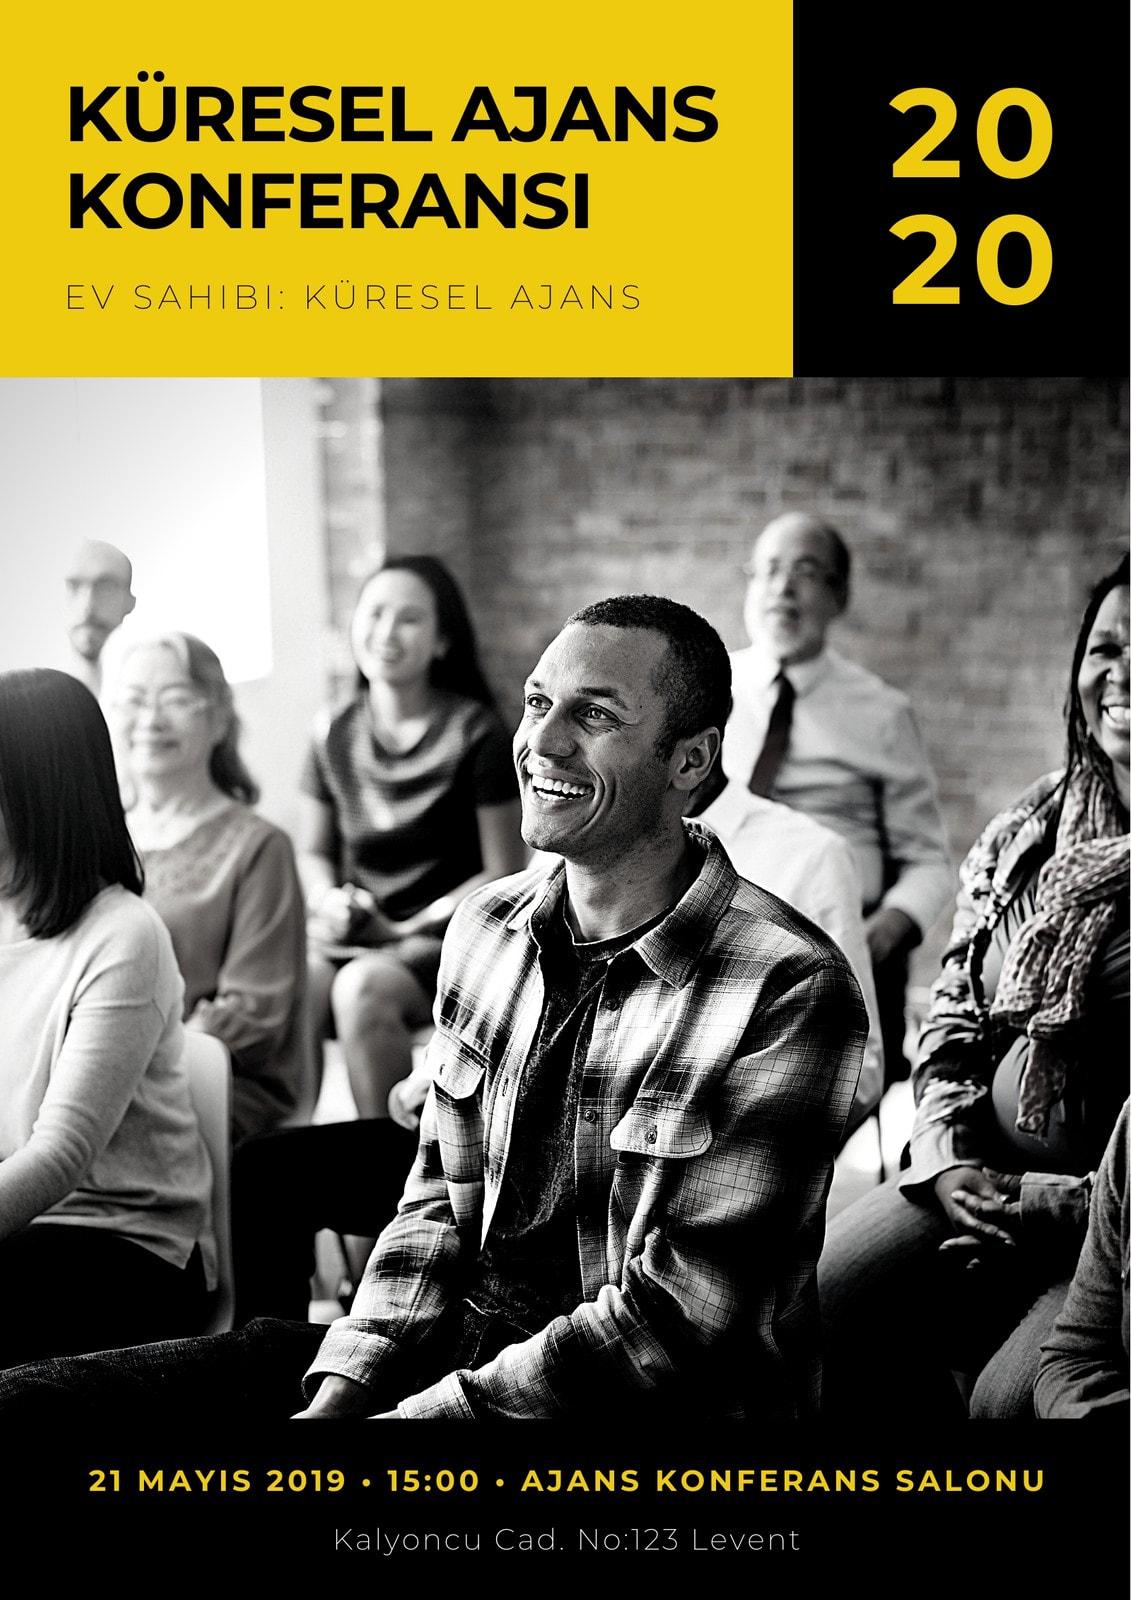 Siyah Sarı Sade Modern Kurumsal Konferans Program